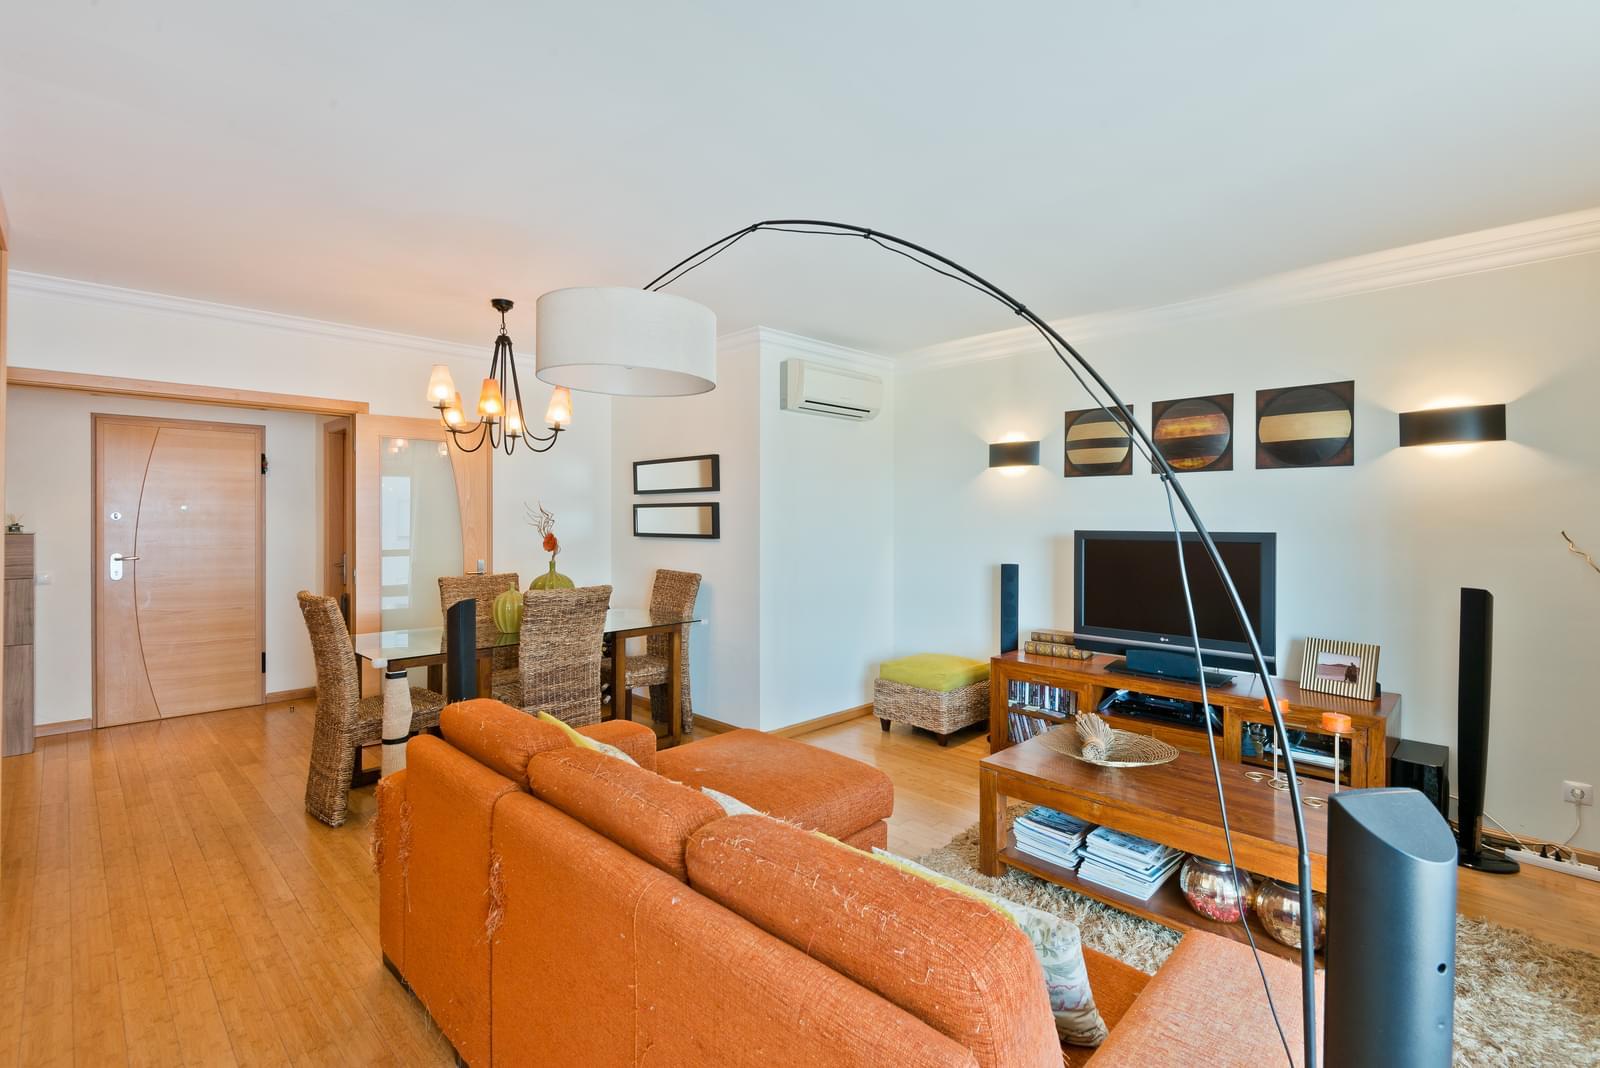 pf17498-apartamento-t2-cascais-811d1da0-7d1b-4597-9c1d-fd547927b904